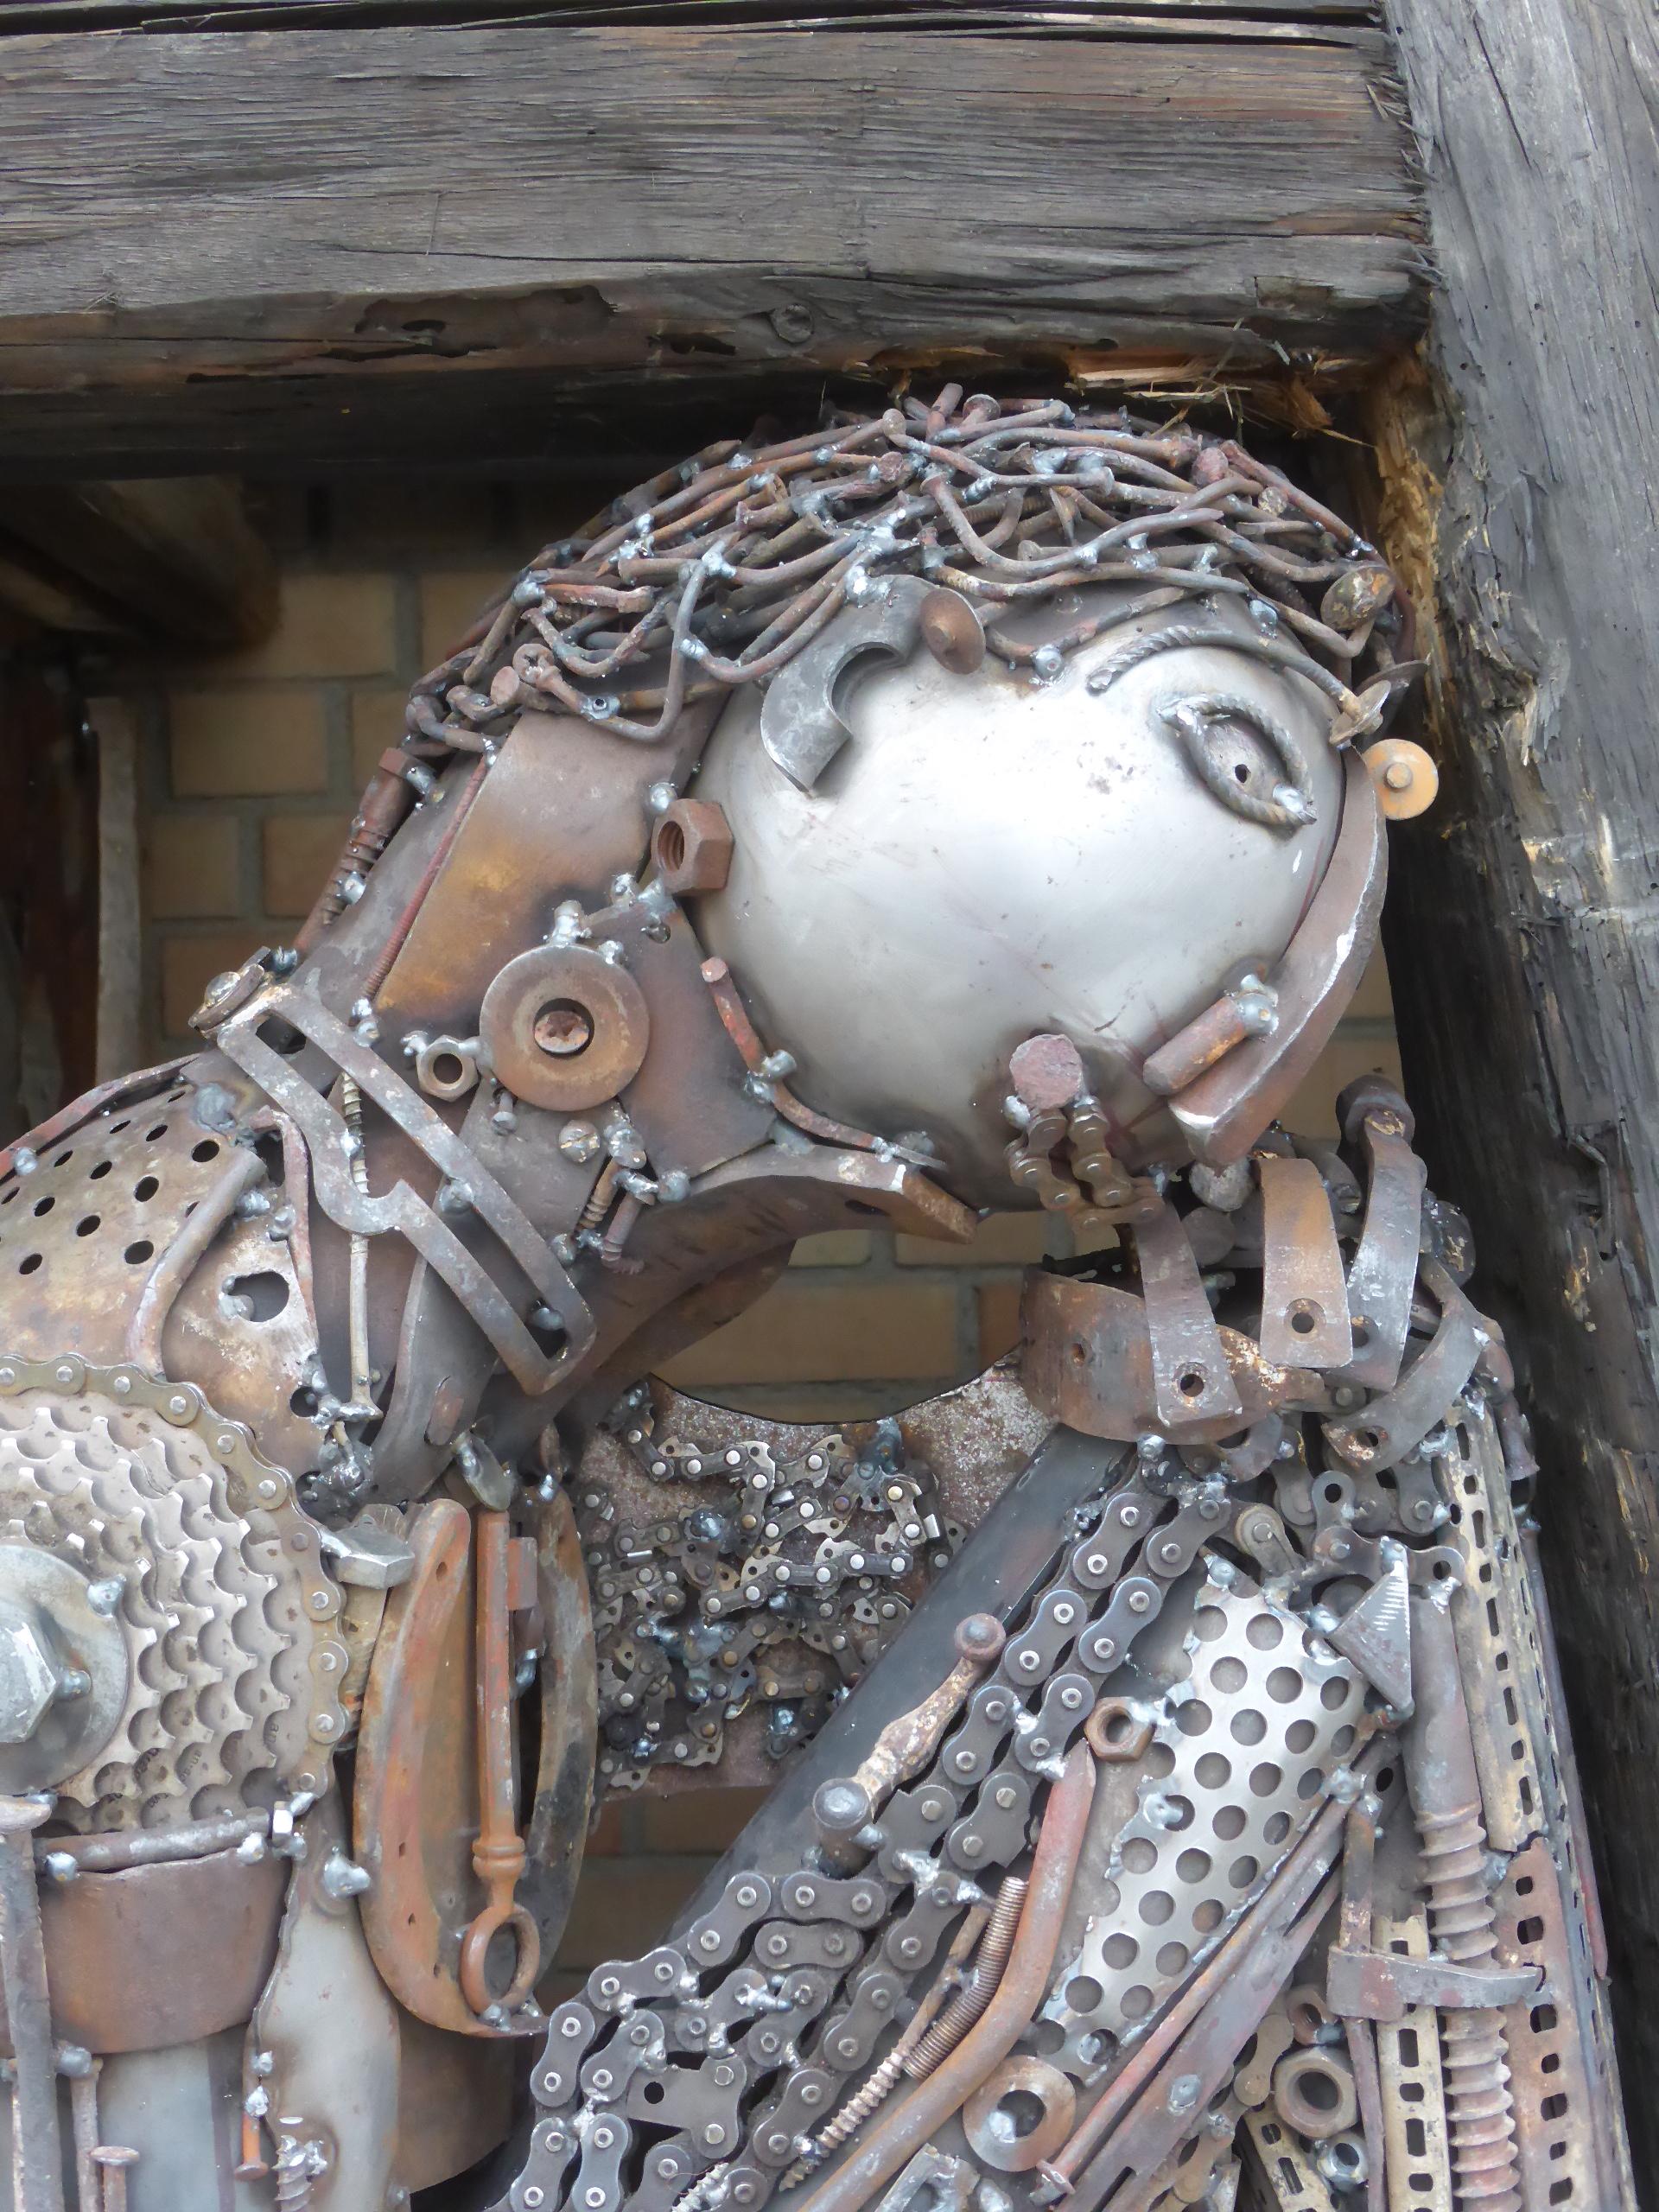 Mo-nail art | Steel nails used in art, Nagel Skulpturen in der Kunst